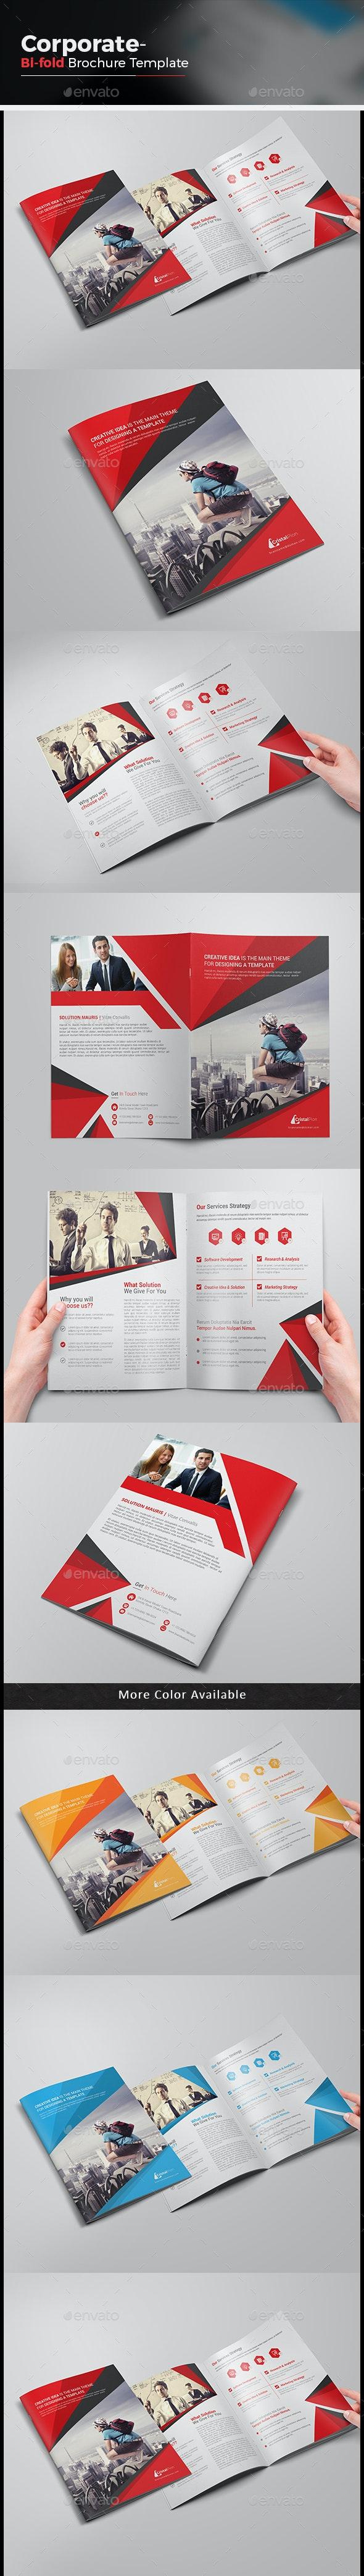 Business Bi-fold Brochure-Multipurpose - Corporate Brochures